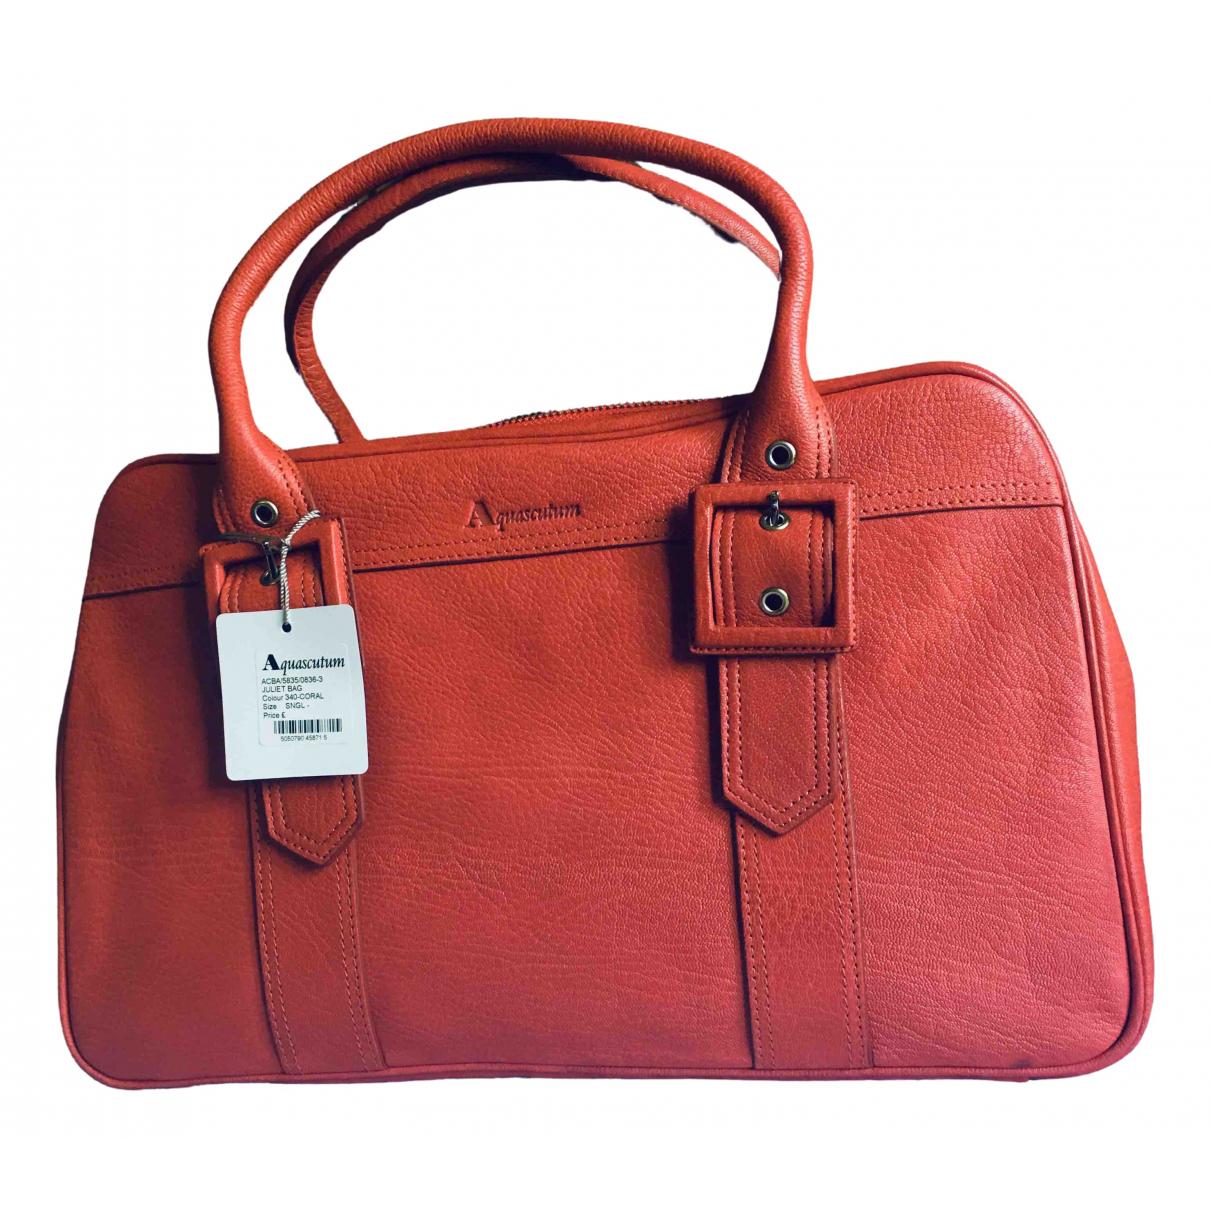 Aquascutum \N Handtasche in Leder